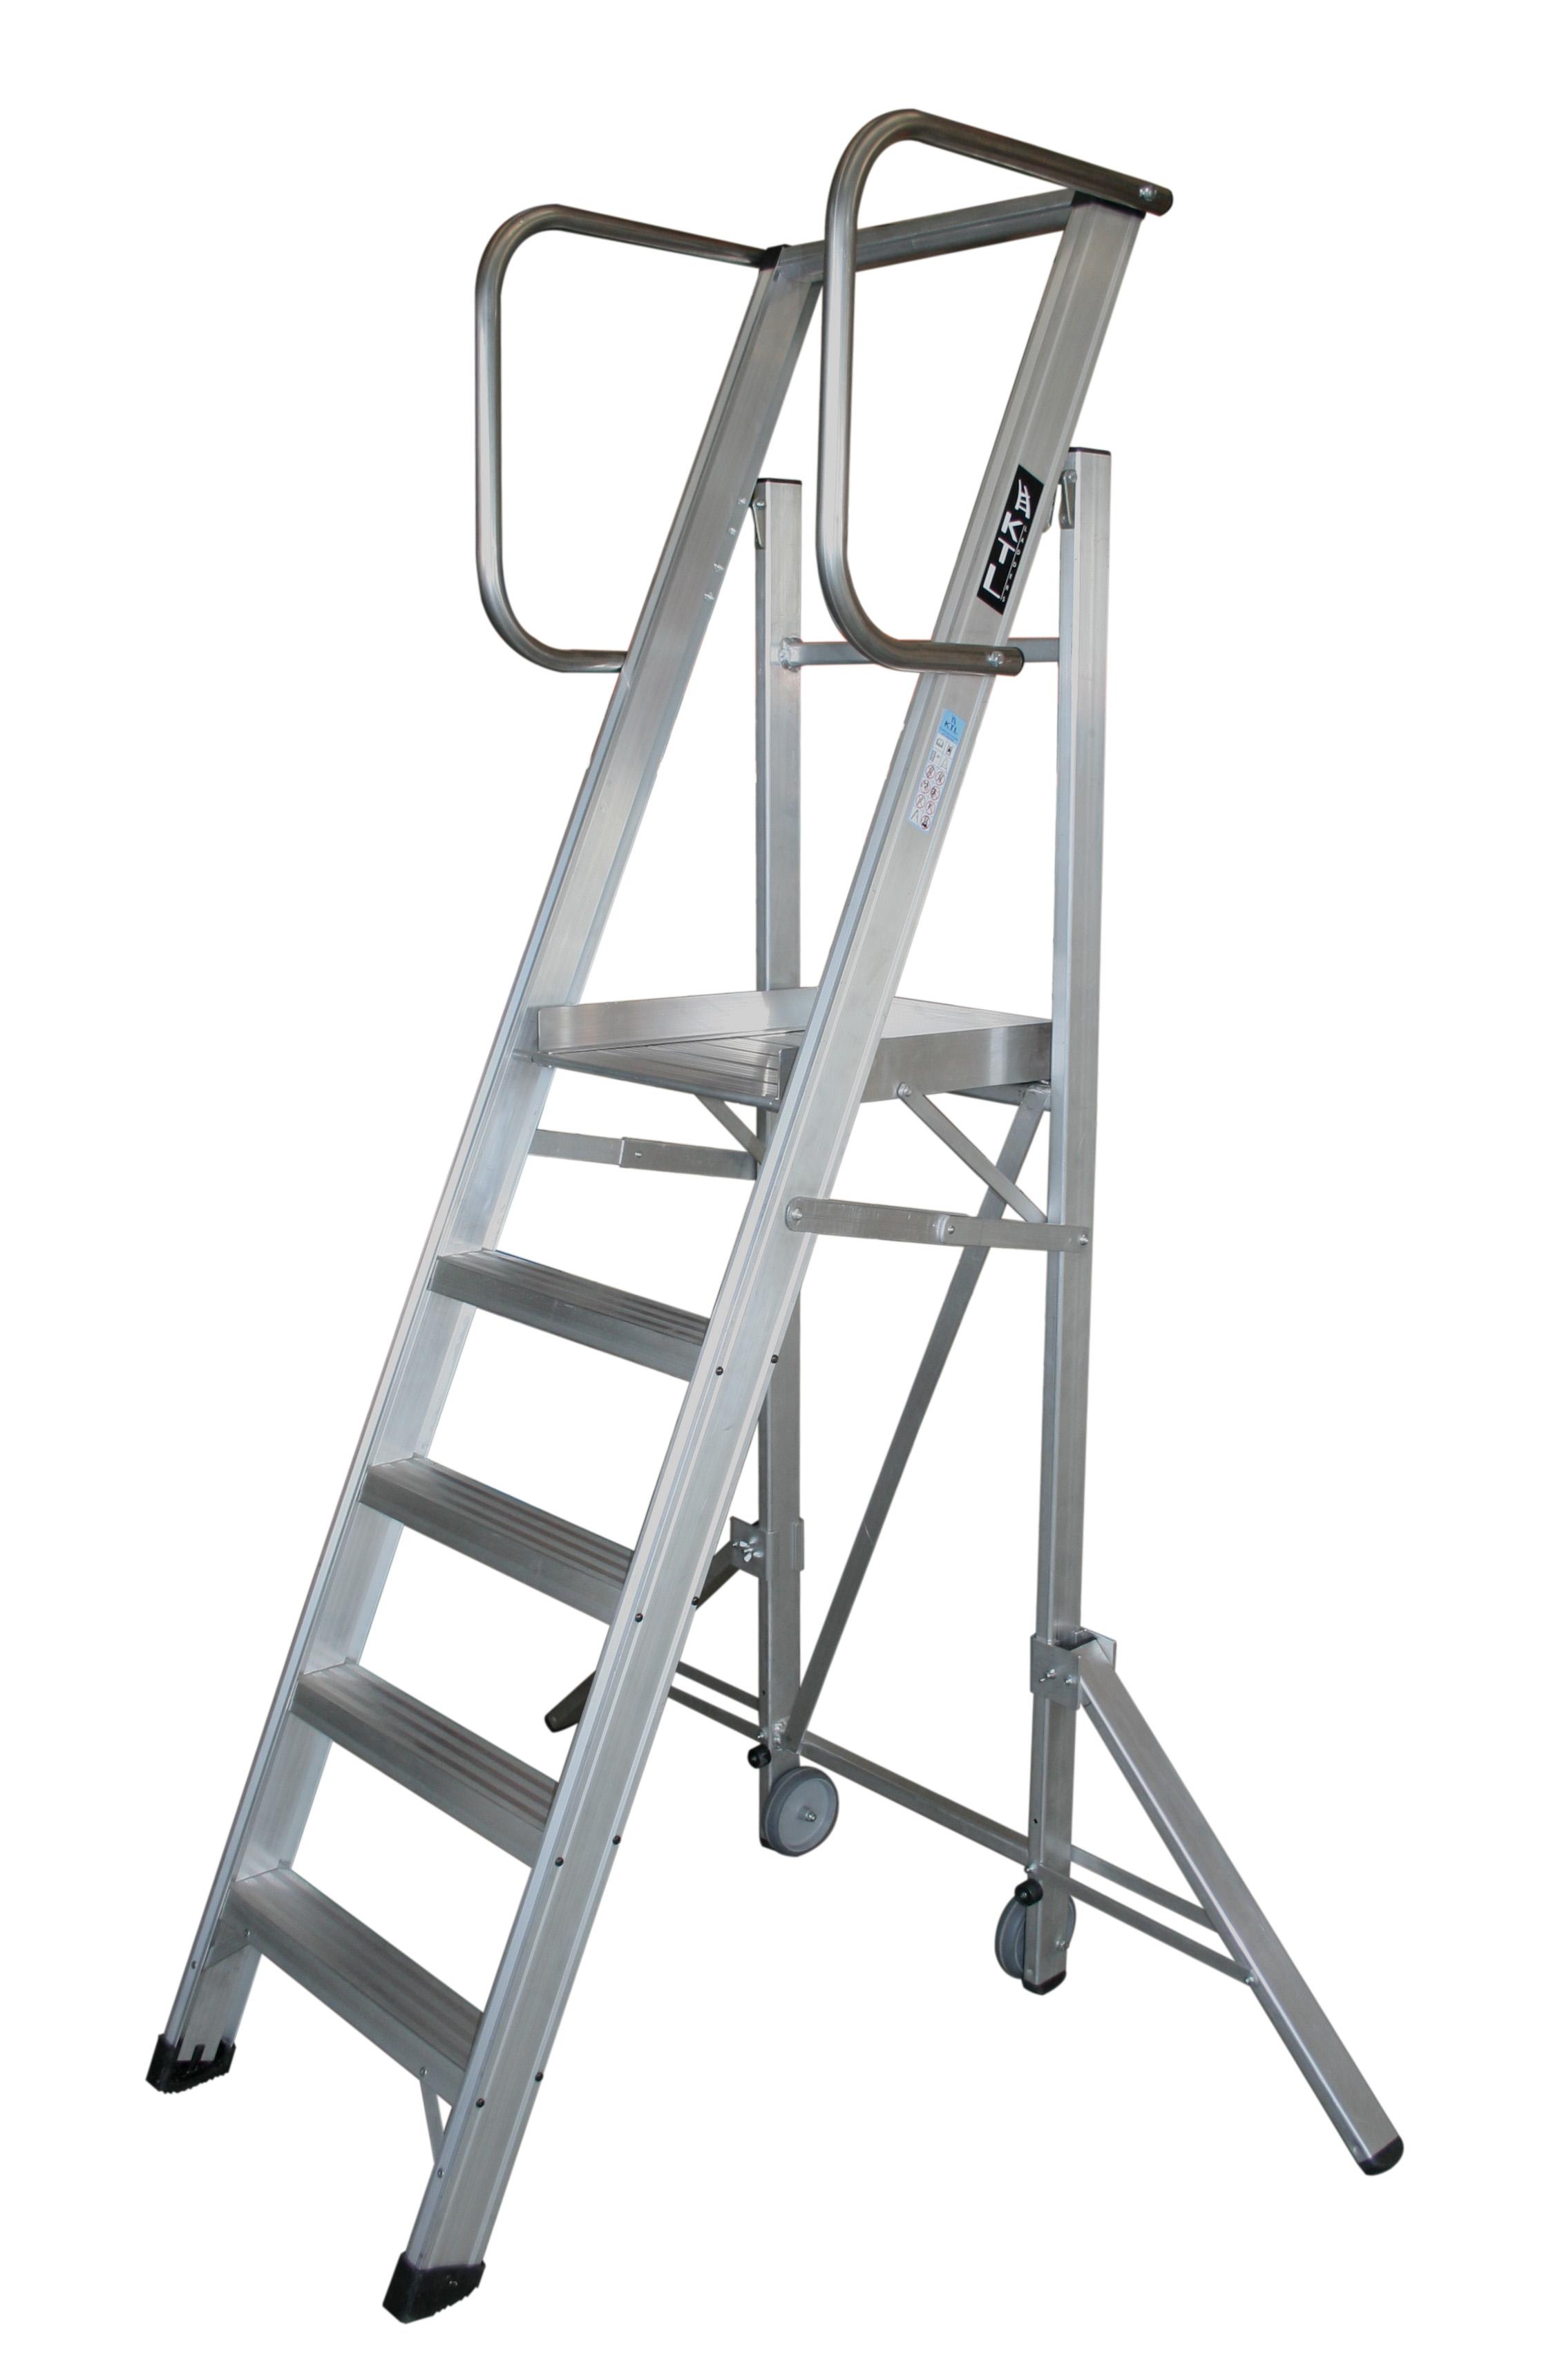 escalera móvil con plataforma, plegable, kastle Escalera móvil con plataforma, plegable, K-WORK k work 5peld